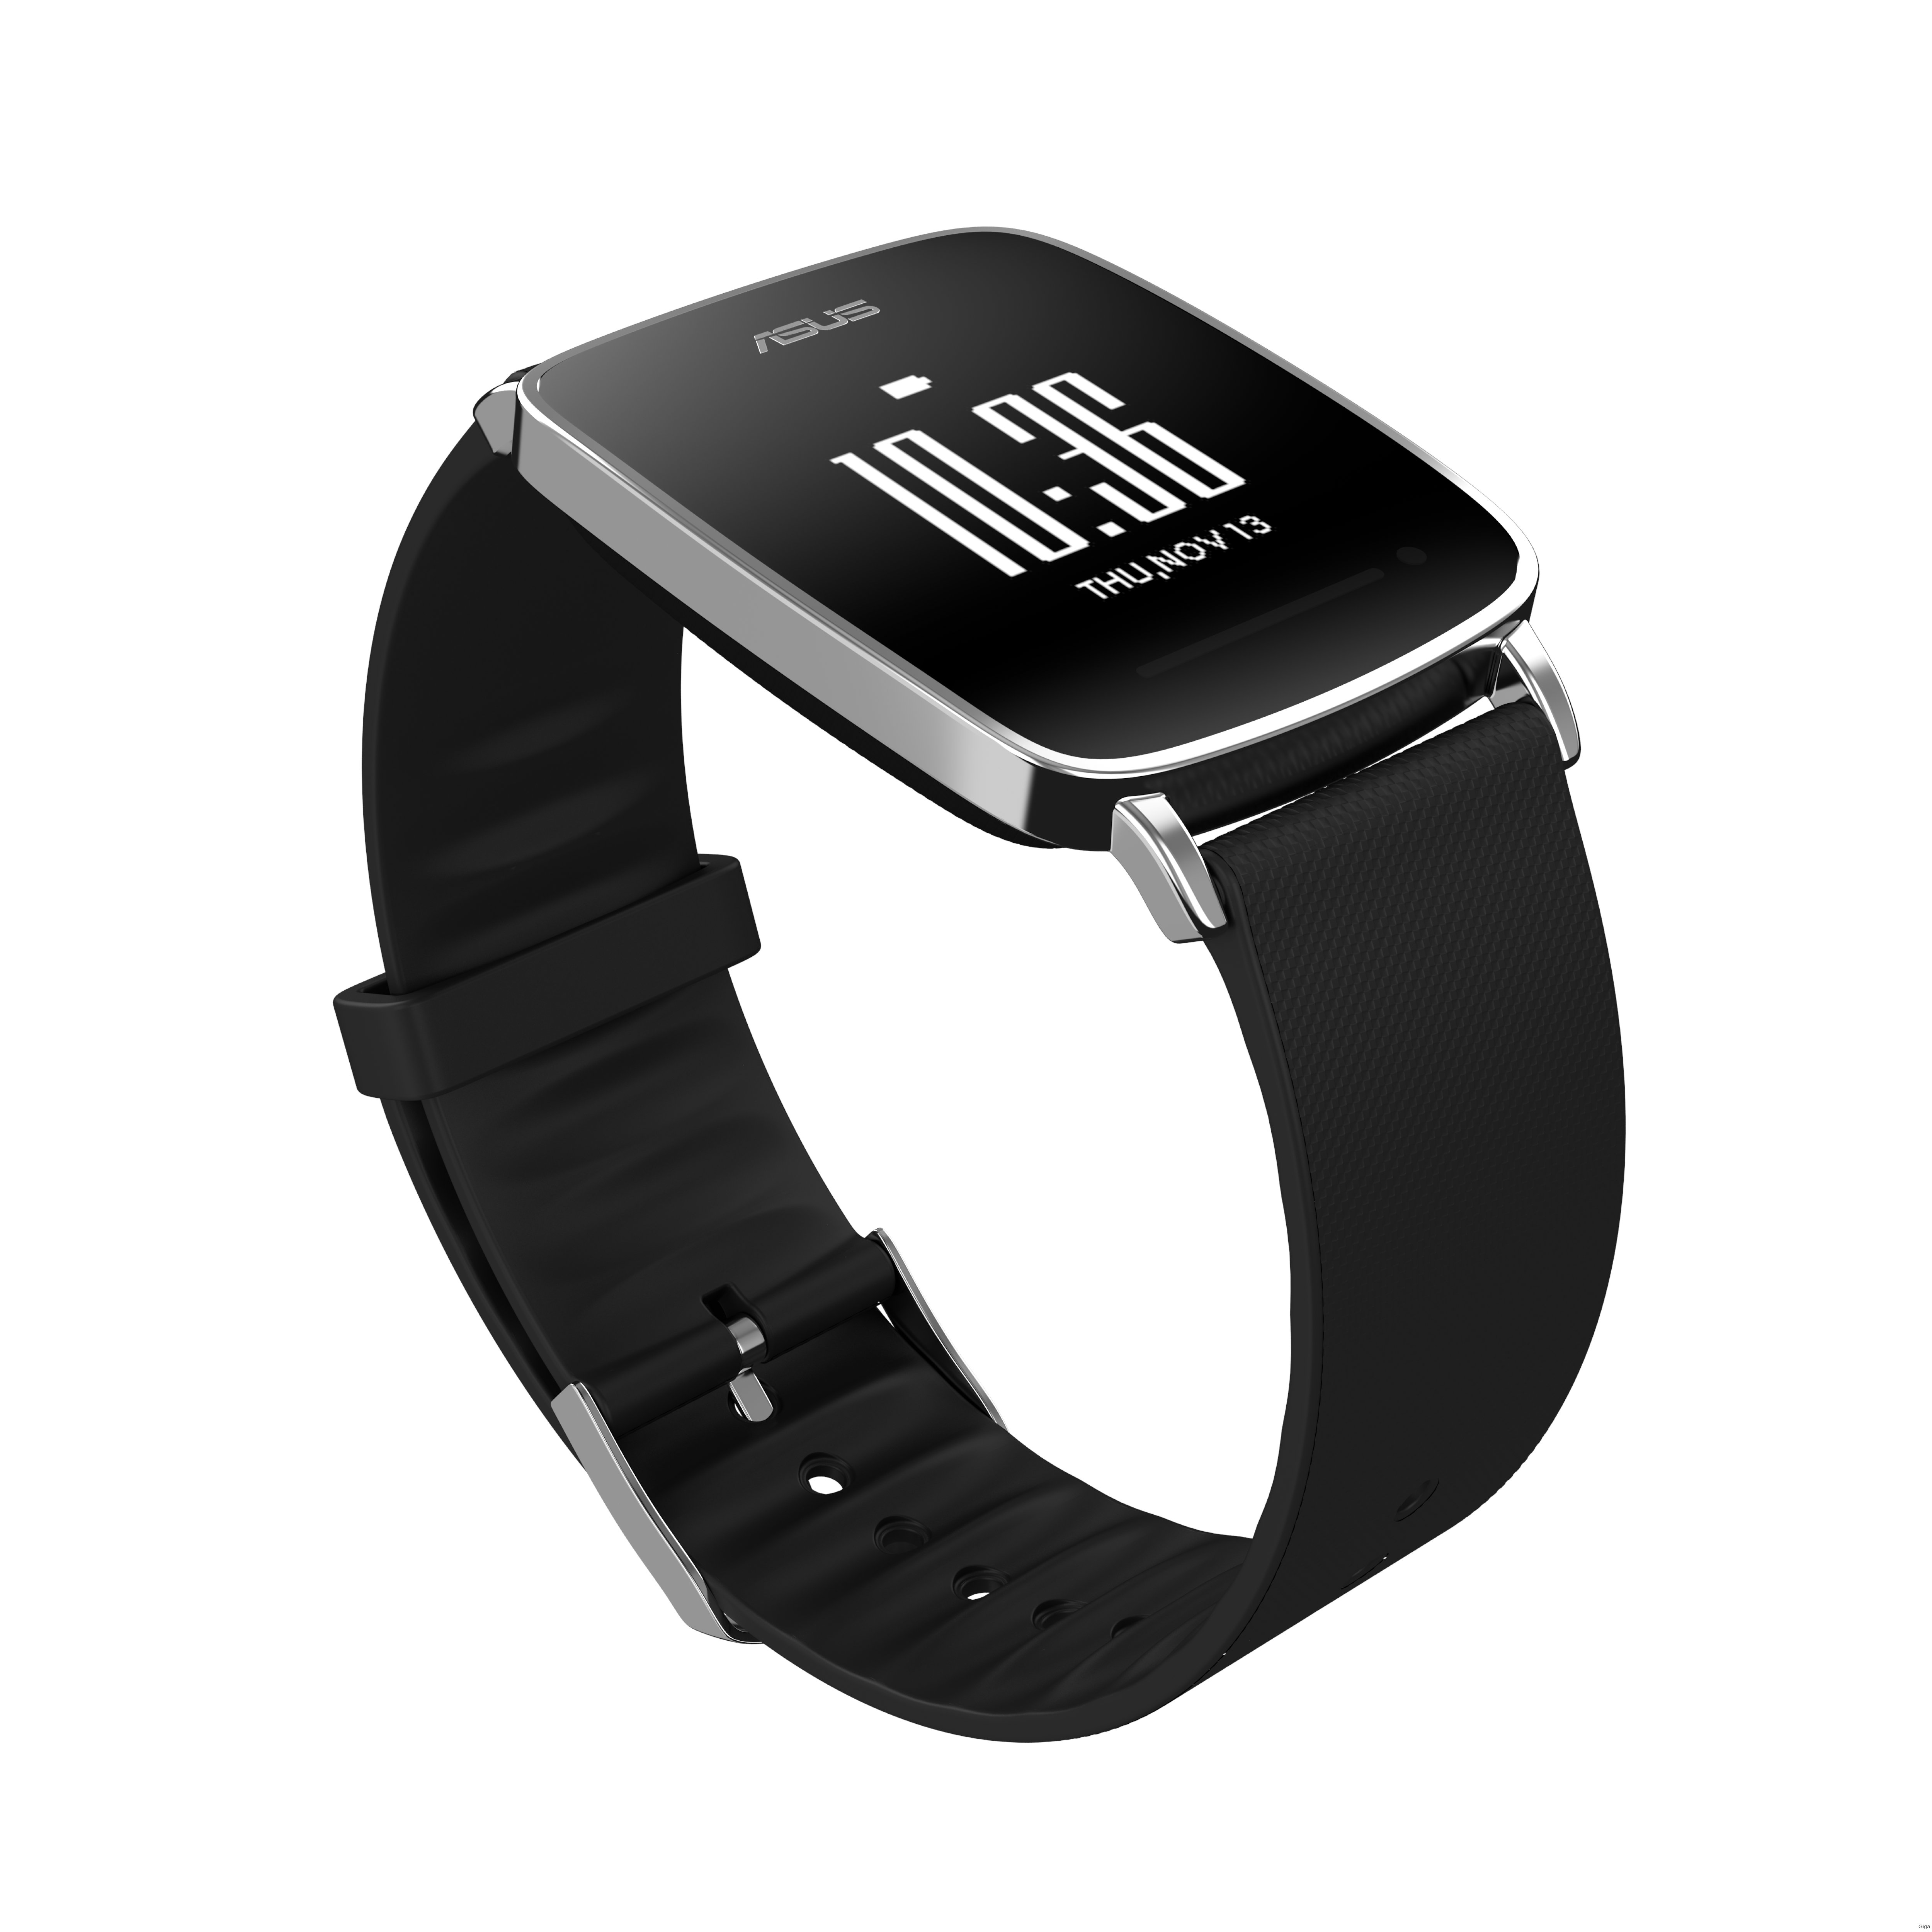 ASUS VivoWatch: Fitness-Wearable mit 10 Tagen Akkulaufzeit angekündigt; erste Hands-On-Videos